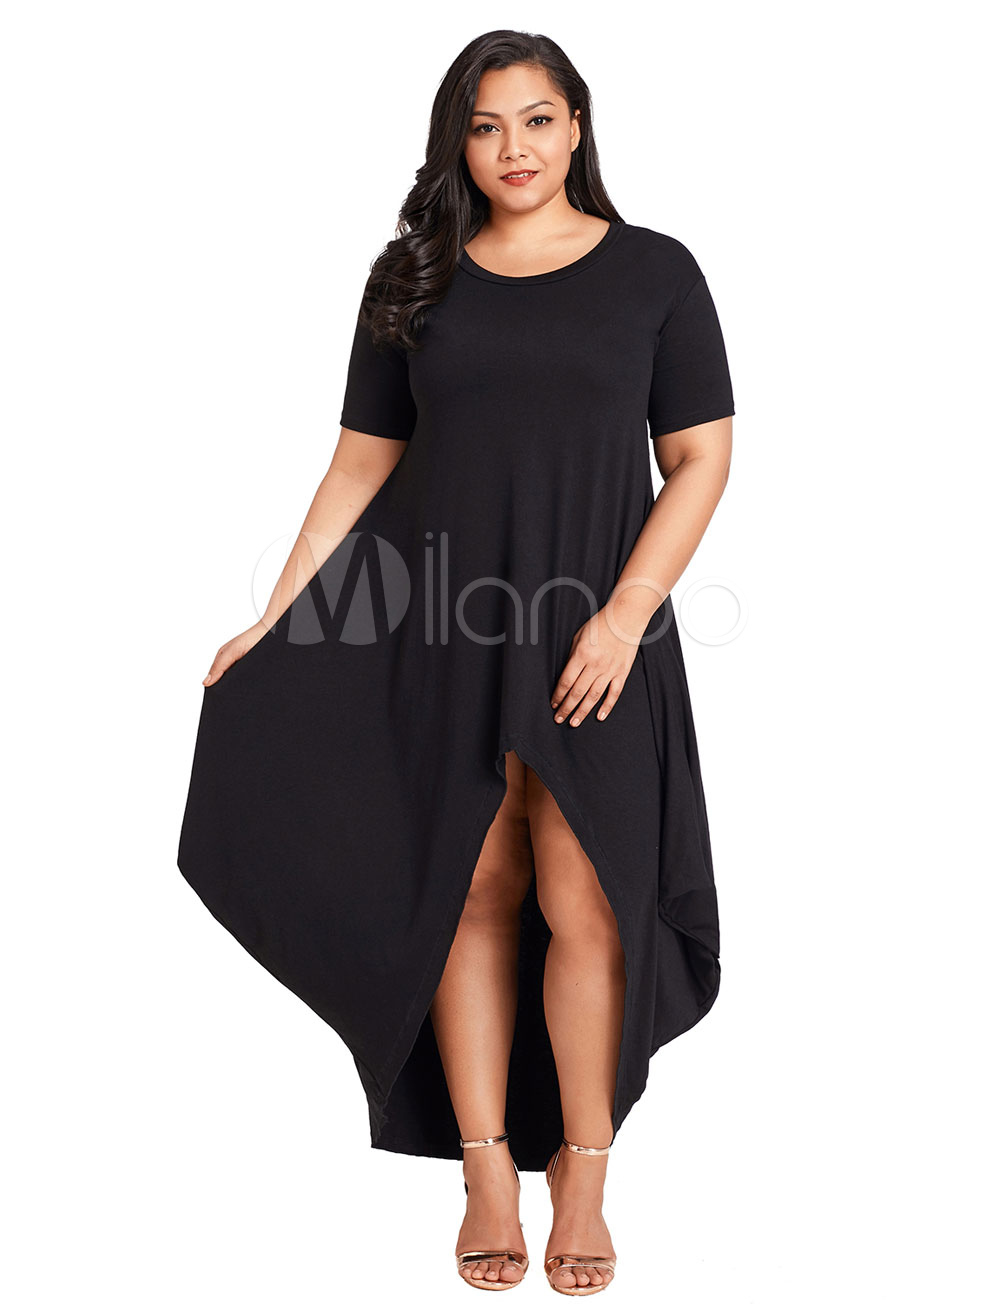 Plus Size Dress Black Short Sleeve High Low Women Summer Dress (Women\\'s Clothing Plus Size Clothing) photo